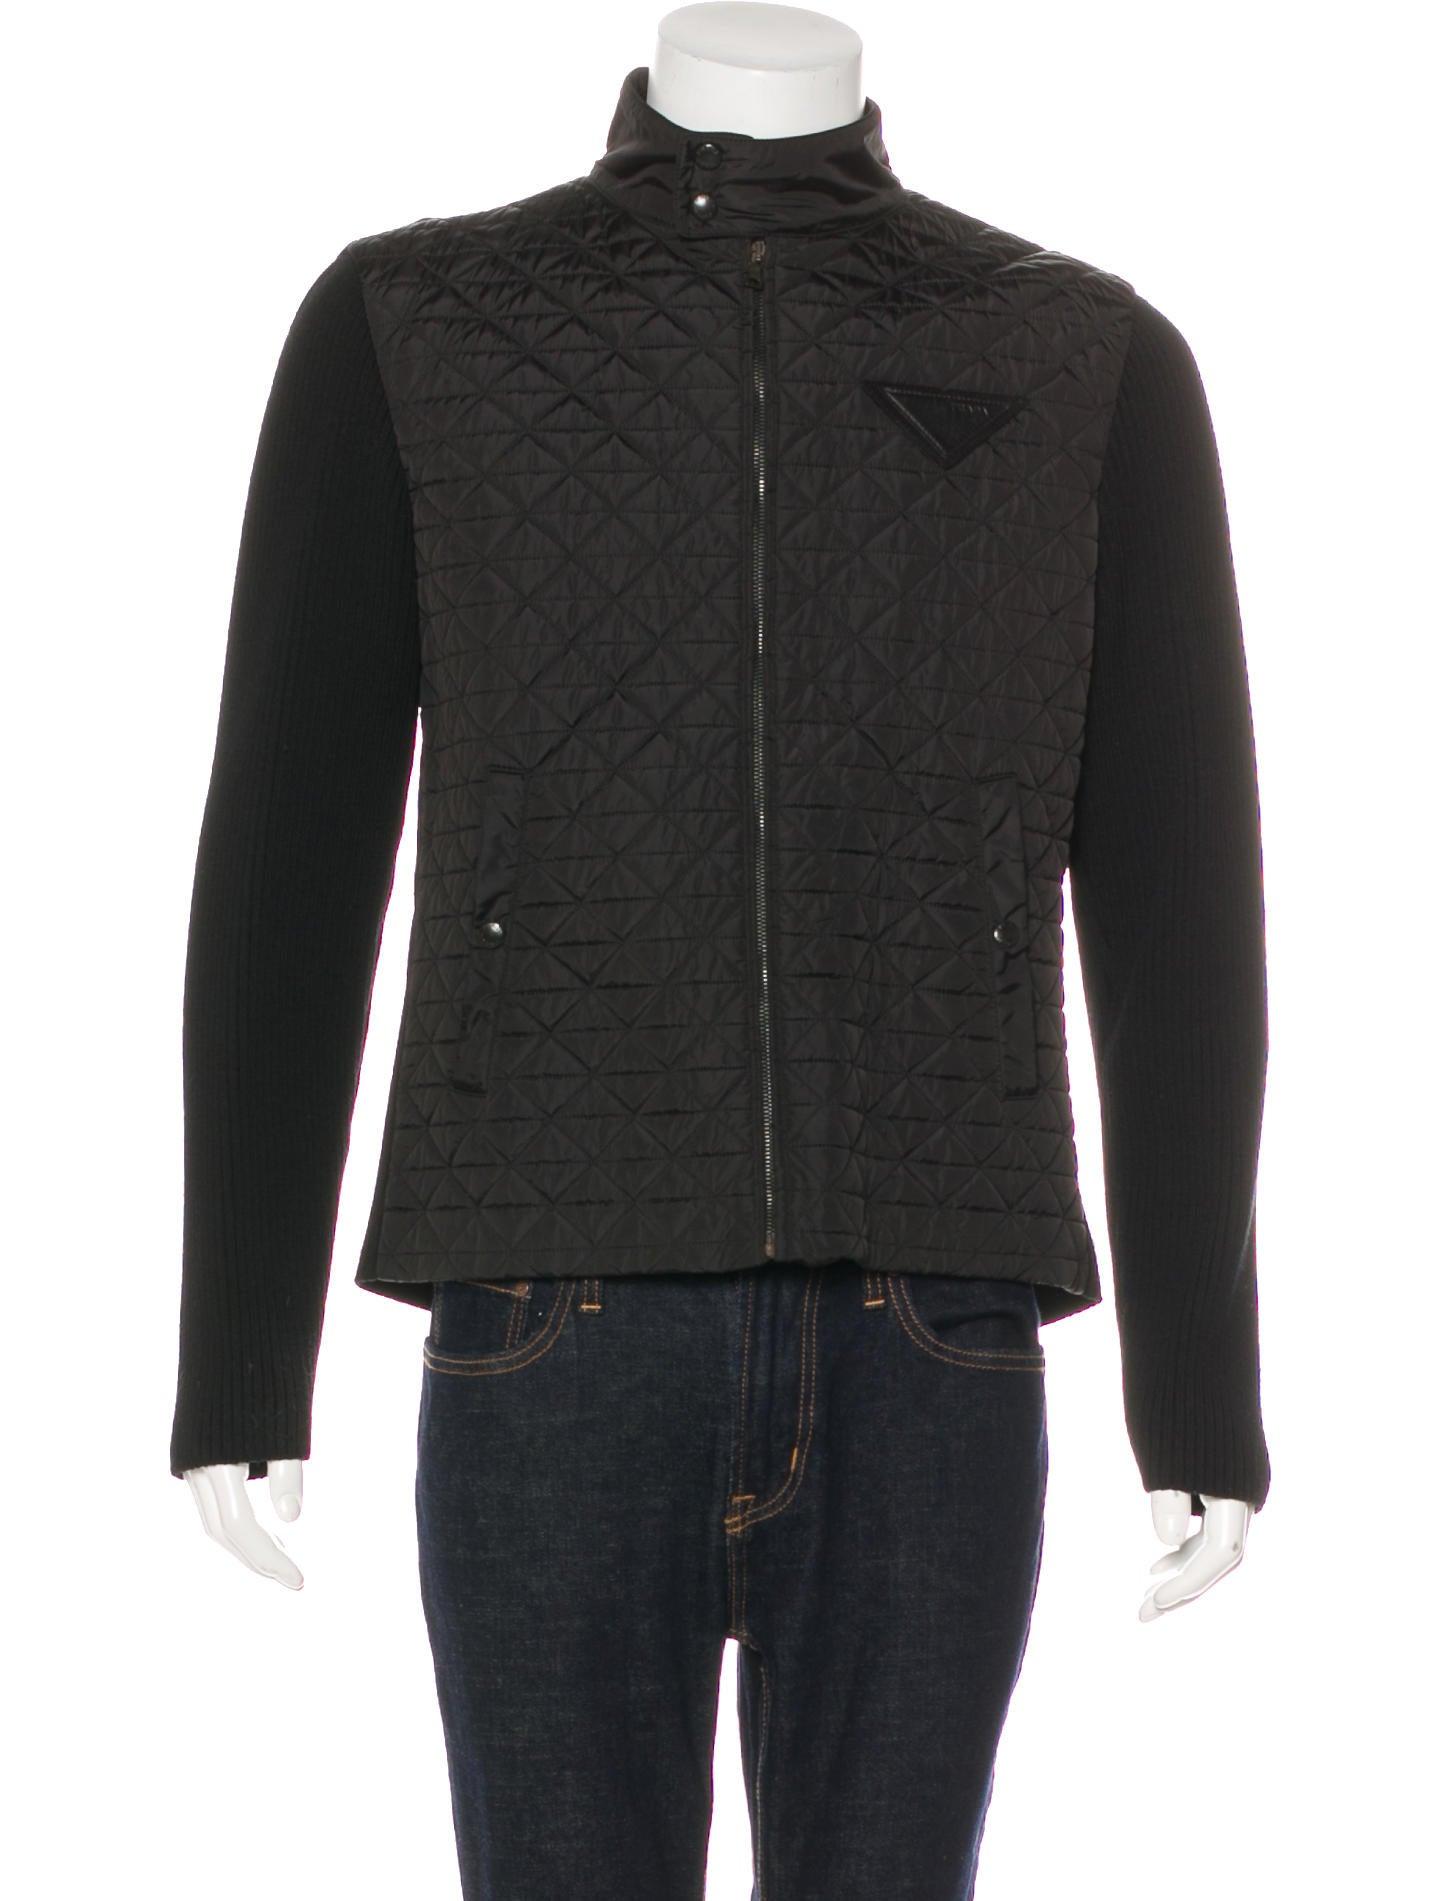 Prada Quilted Wool Jacket Clothing Pra189548 The